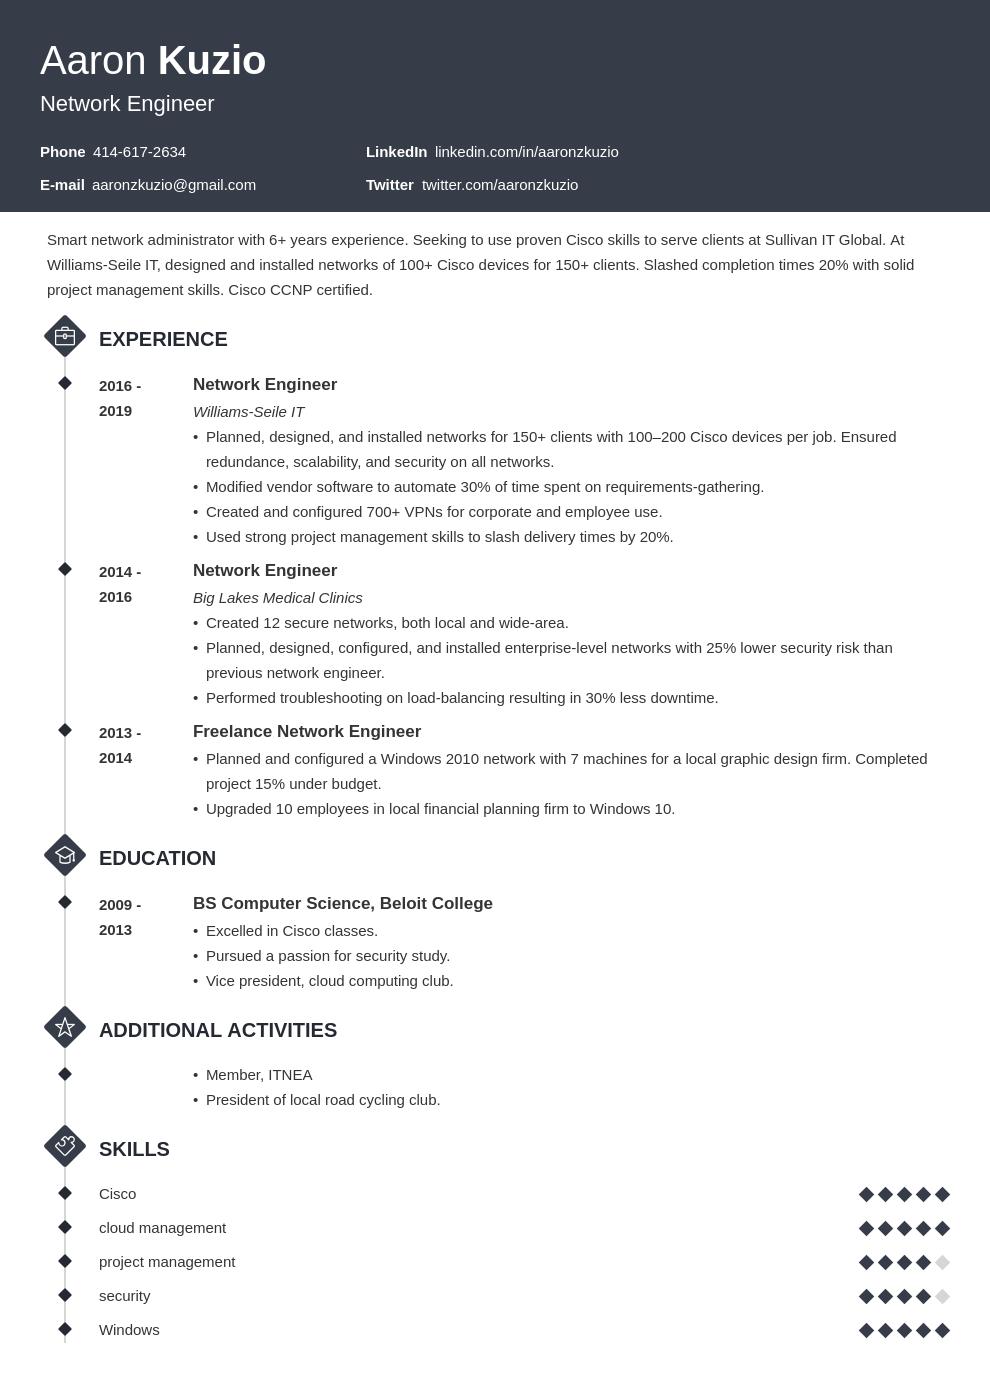 network engineer template diamond uk